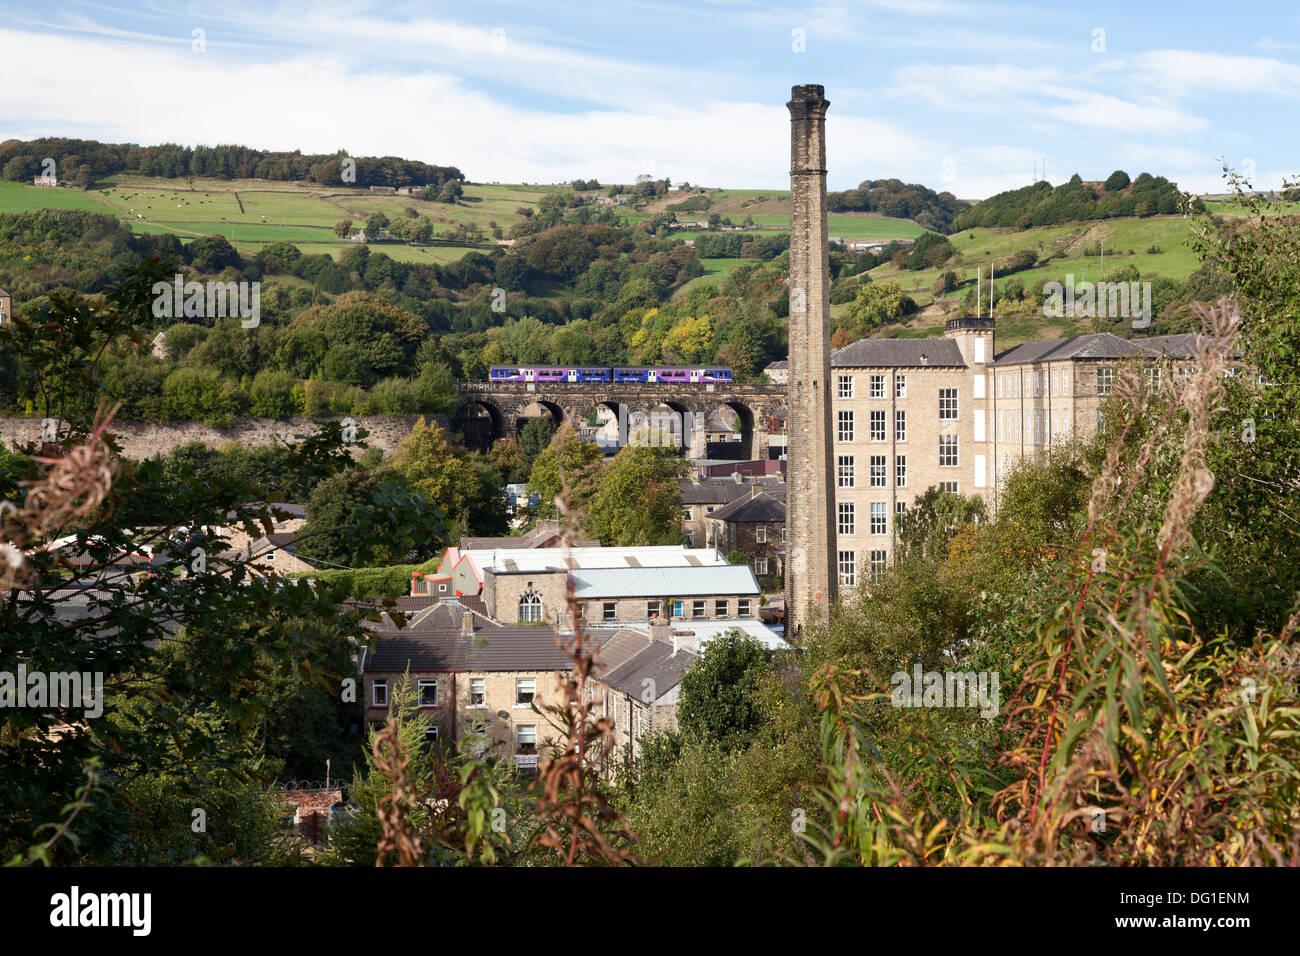 Spa Mills and railway viaduct, Slaithwaite, West Yorkshire - Stock Image